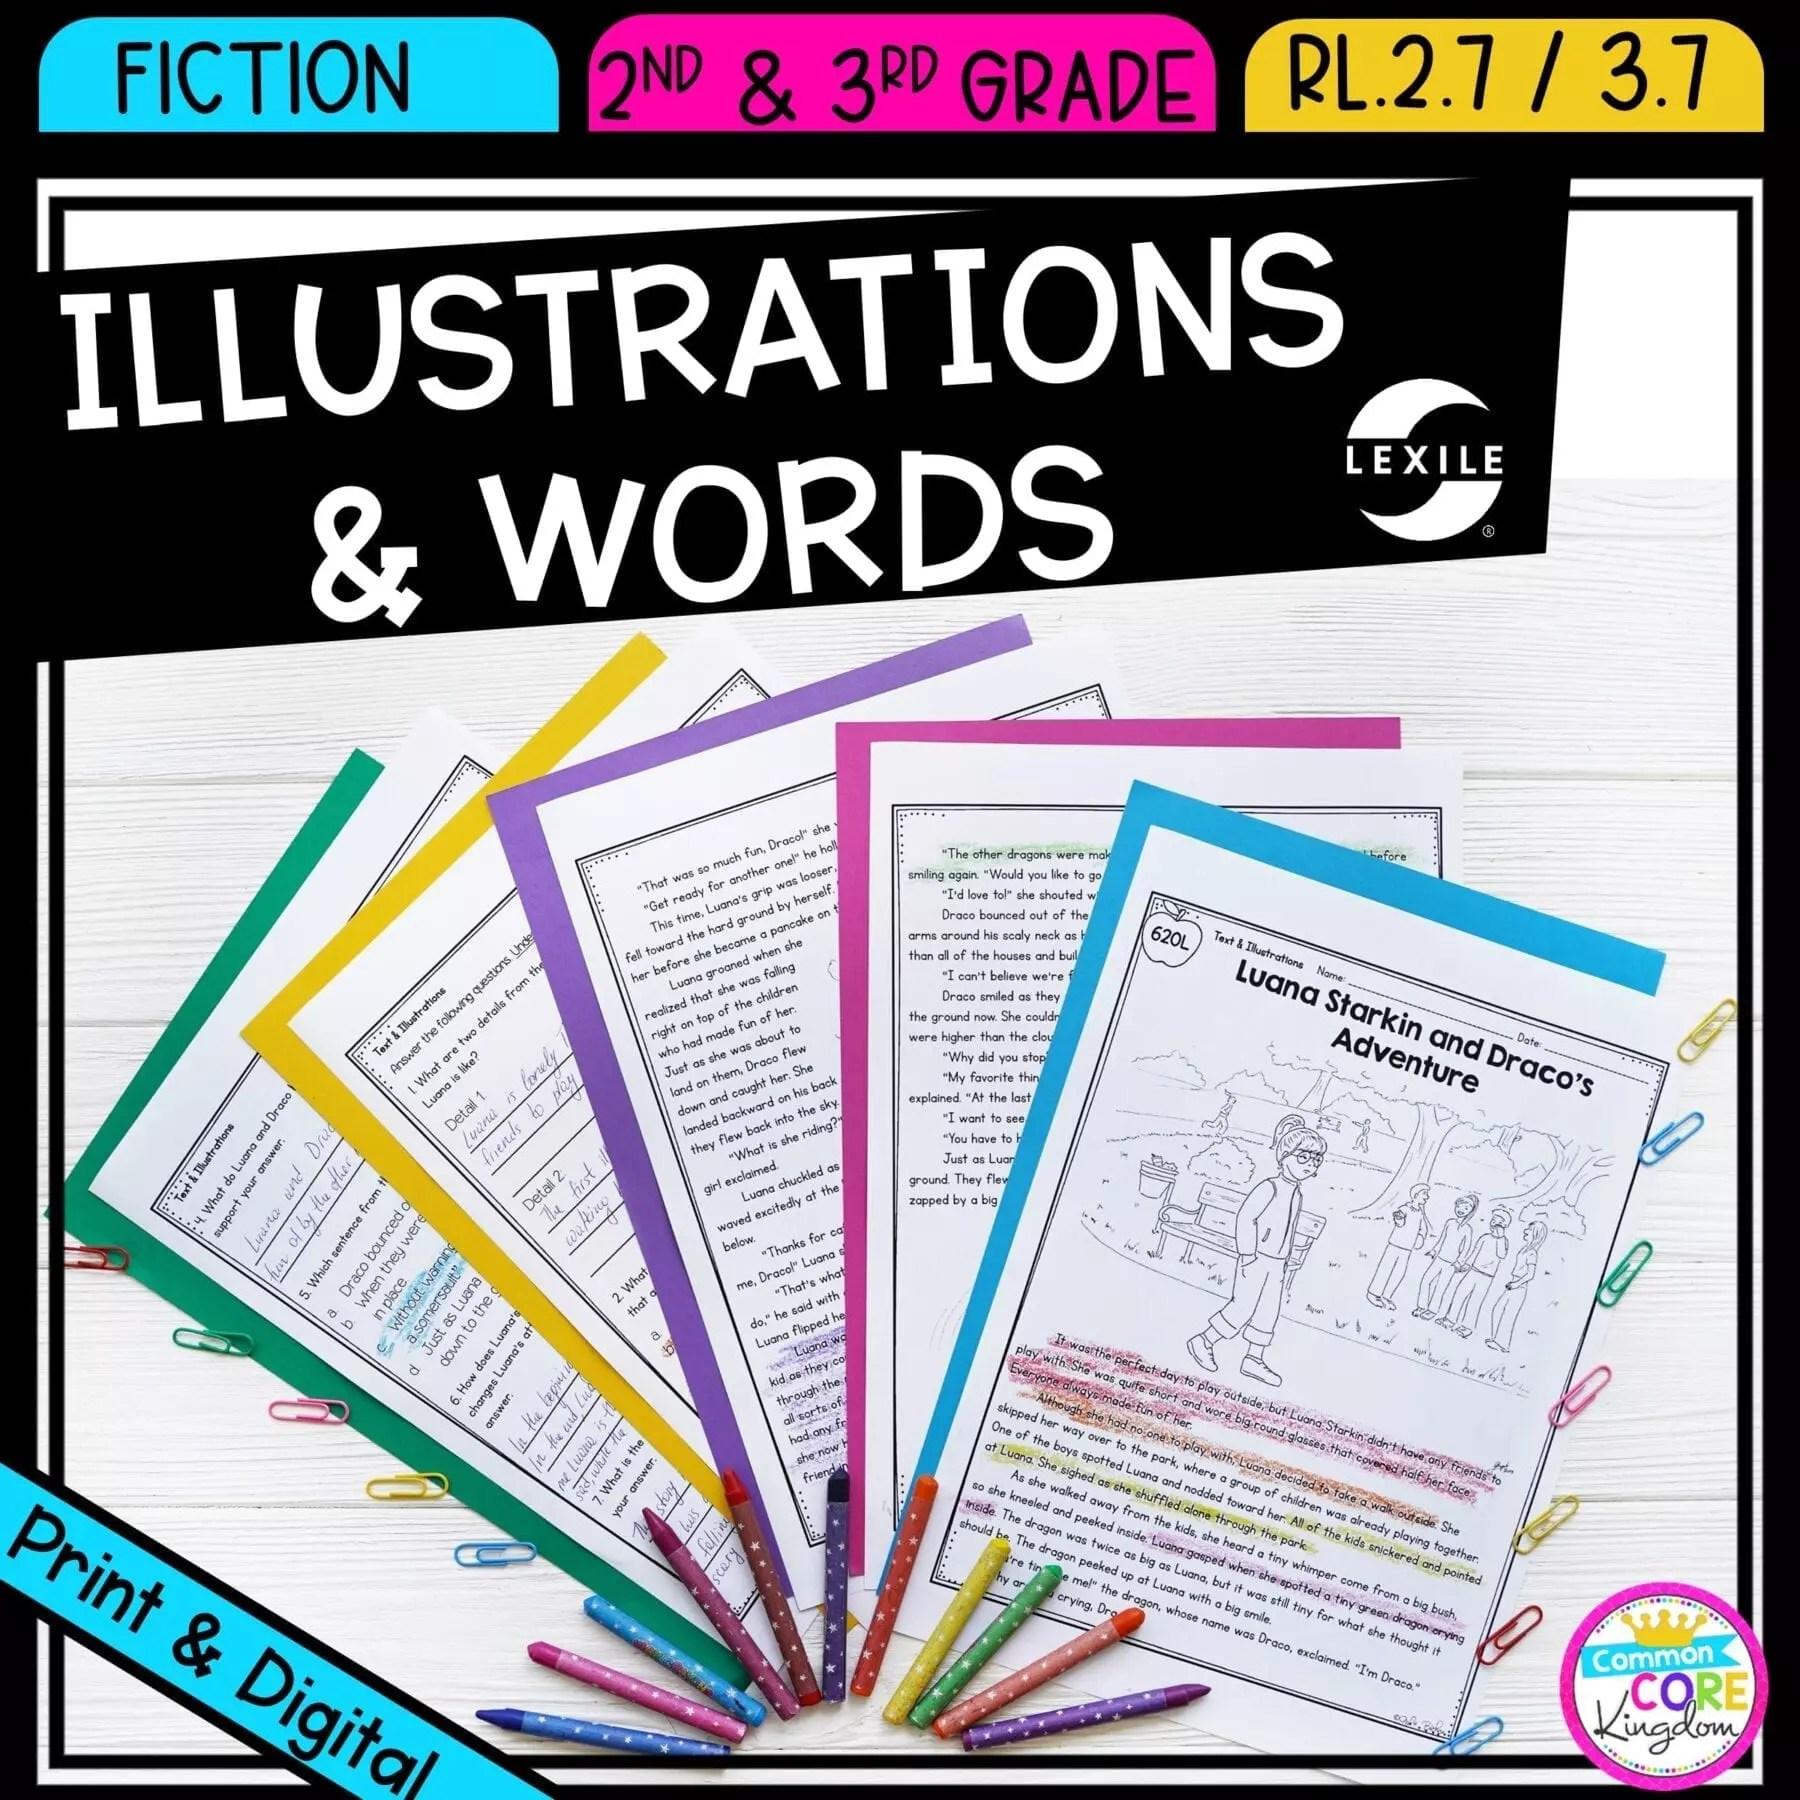 hight resolution of Illustrations \u0026 Words RL.2.7 RL.3.7   Common Core Kingdom